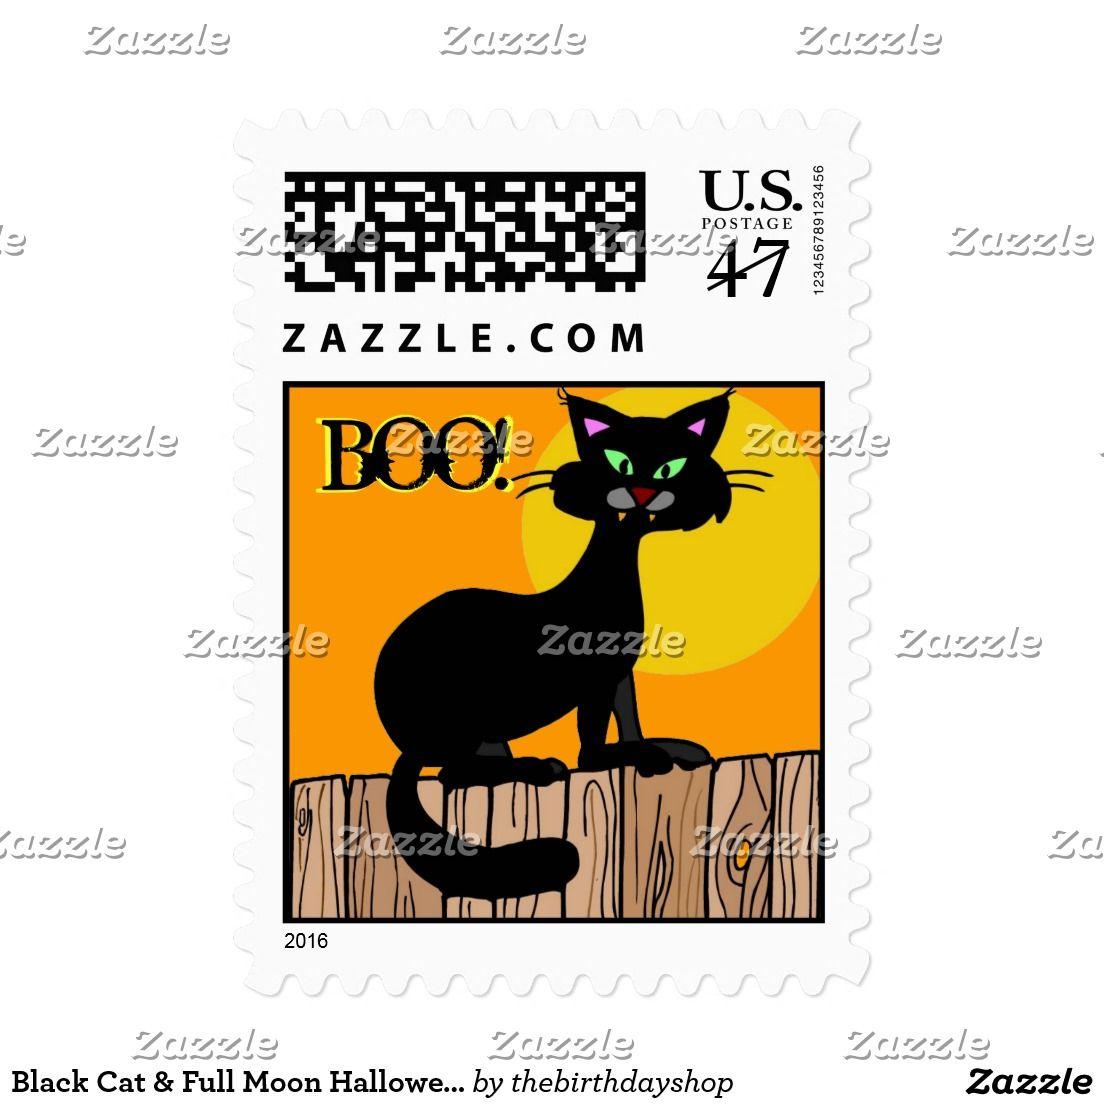 Black Cat & Full Moon Halloween Party Boo Stamps   HALLOWEEN ...